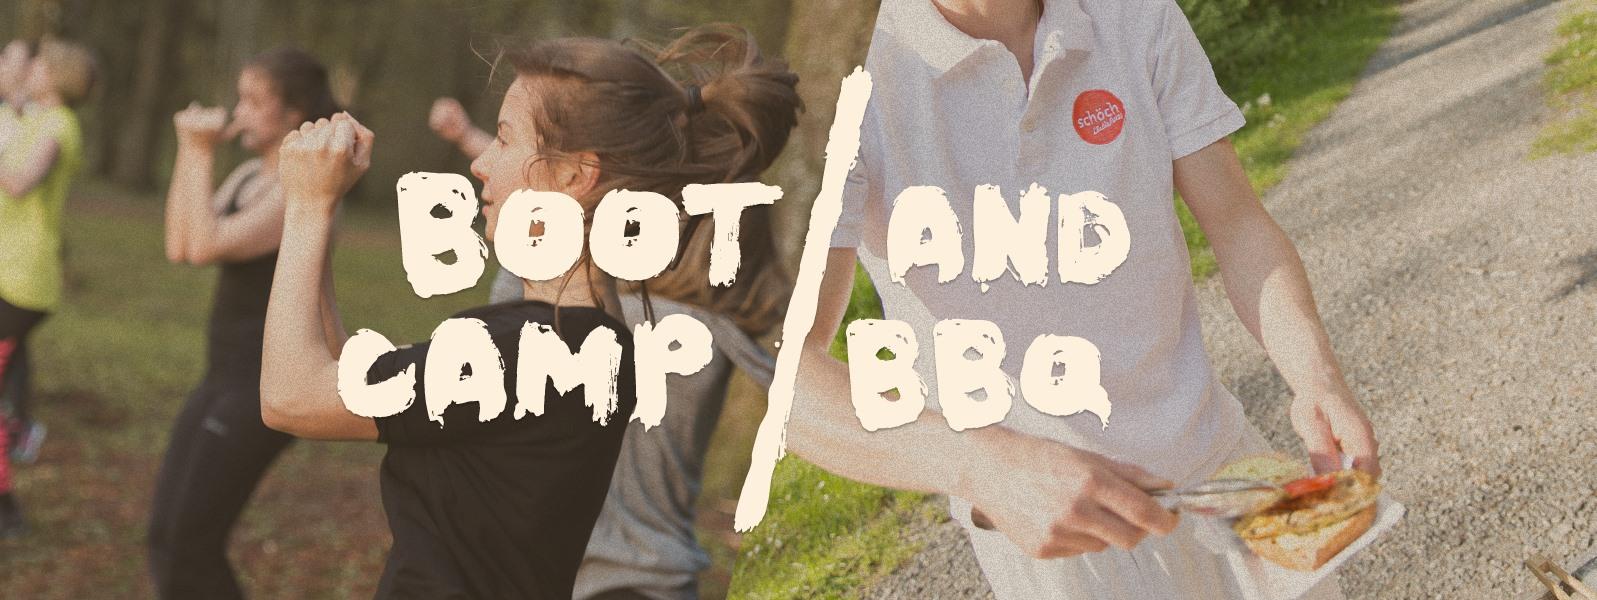 Bootcamp & BBQ